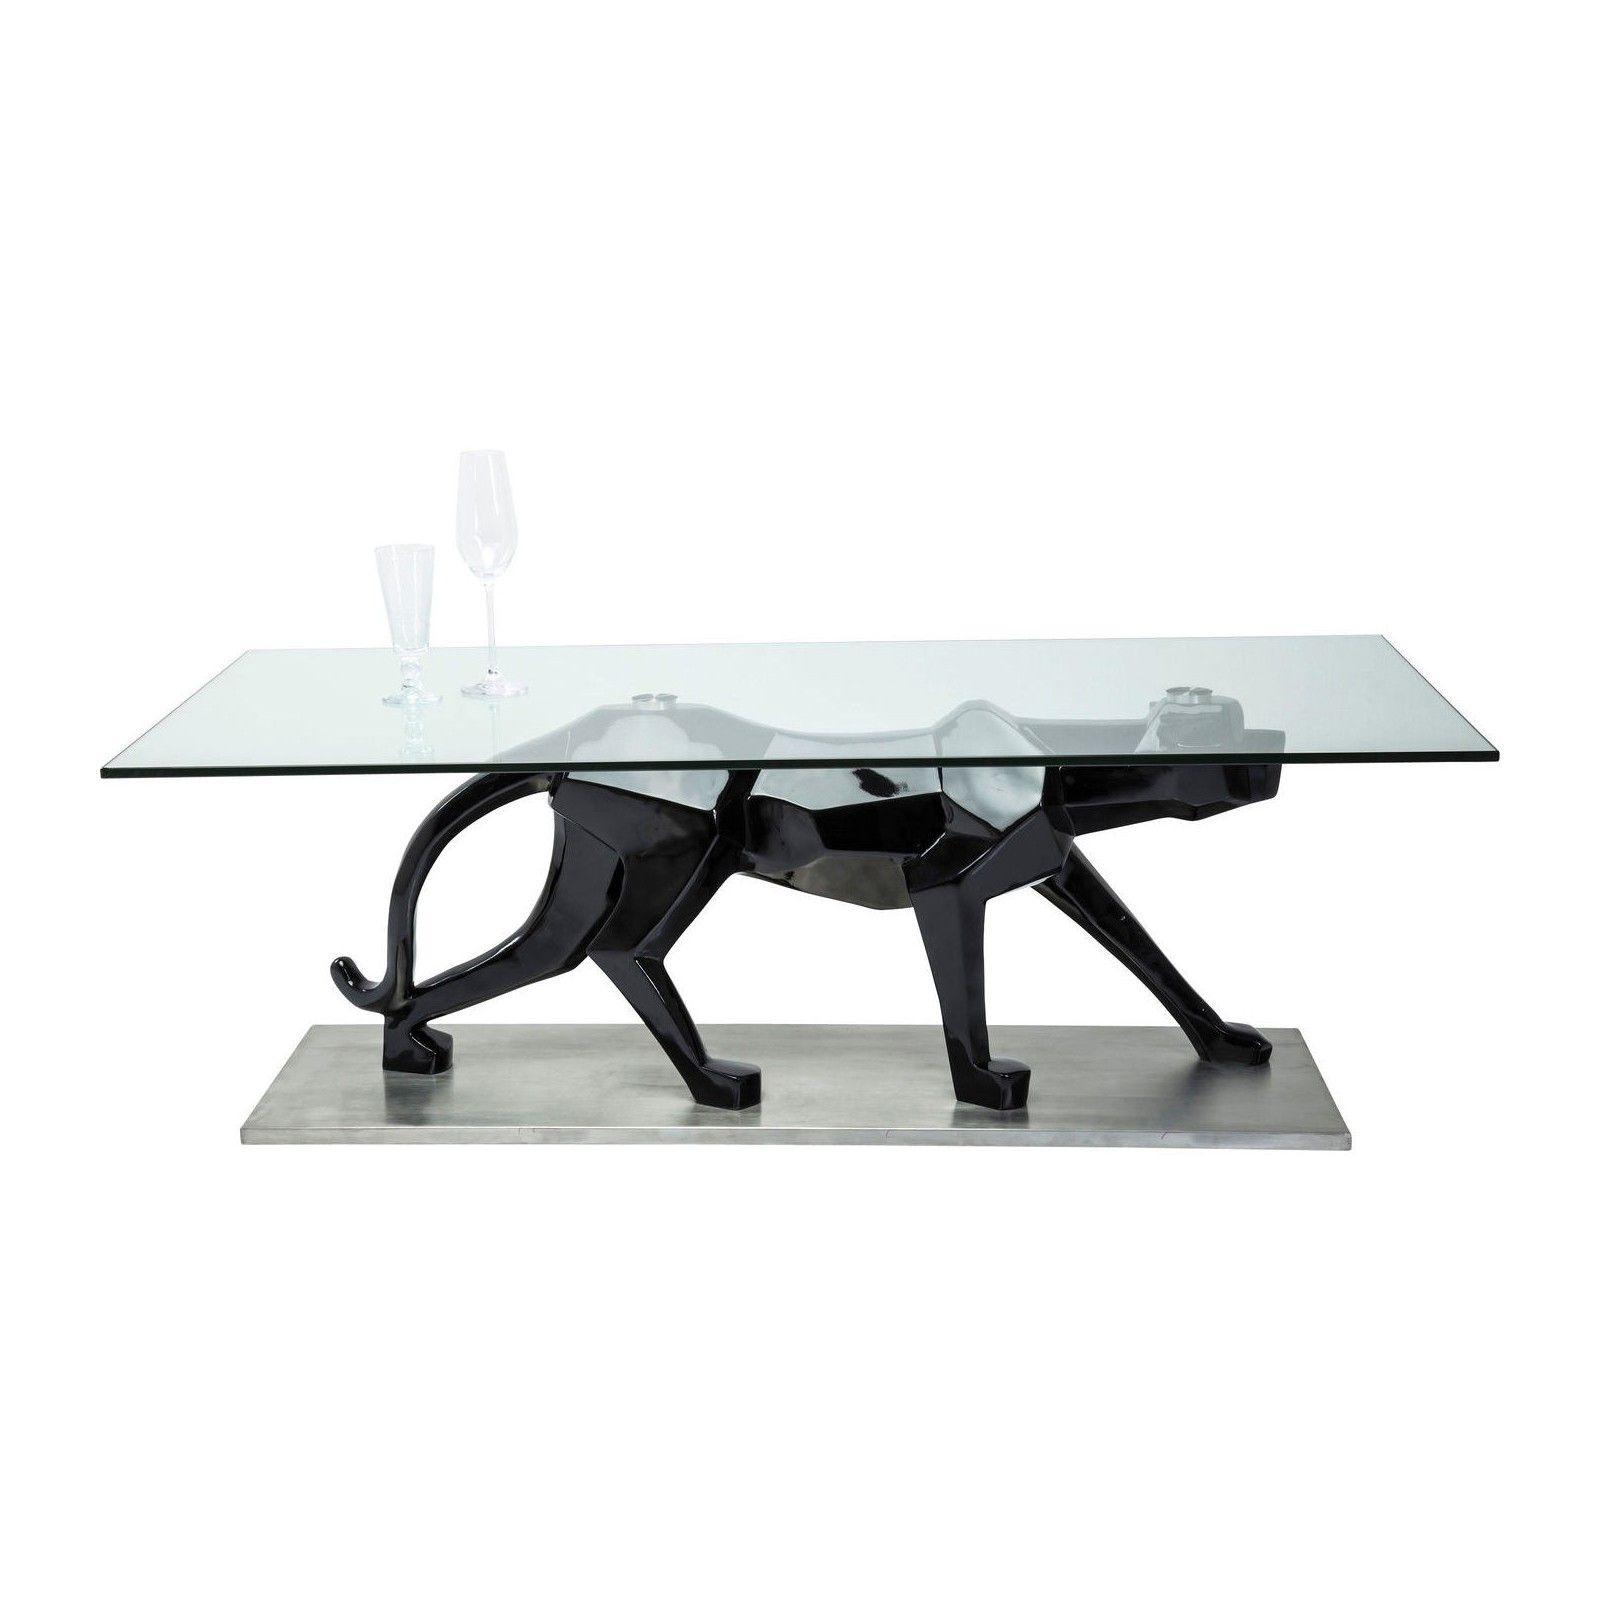 Table Basse En Verre Black Cat 140×70 Cm Kare Design Deco